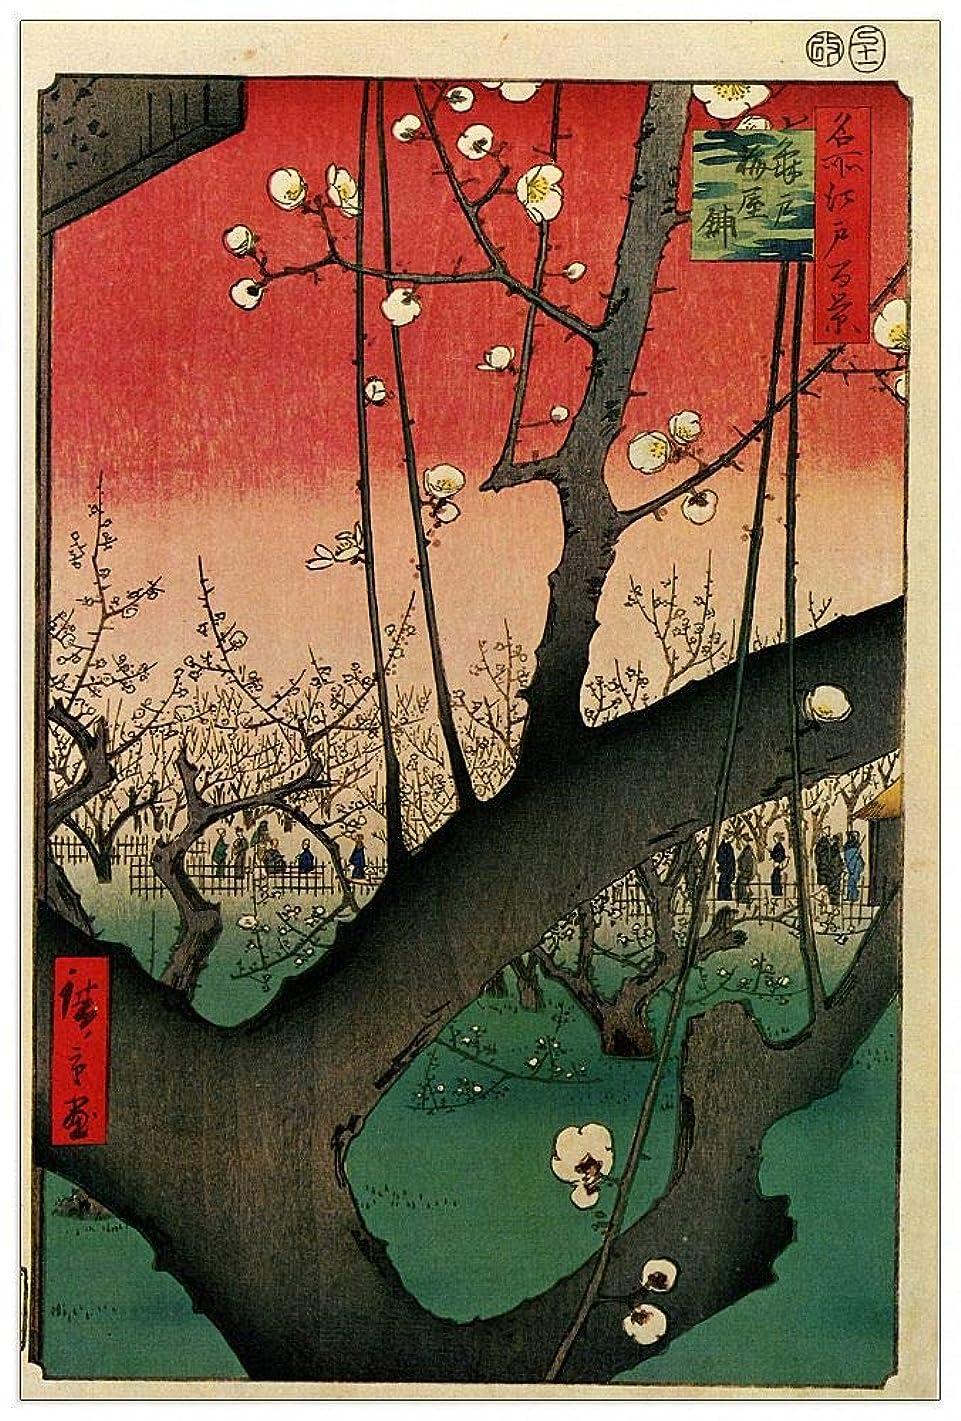 ArtPlaza TW92866 Hiroshige Utagawa - Blooming Trees Decorative Panel 27.5x39.5 Inch Multicolored